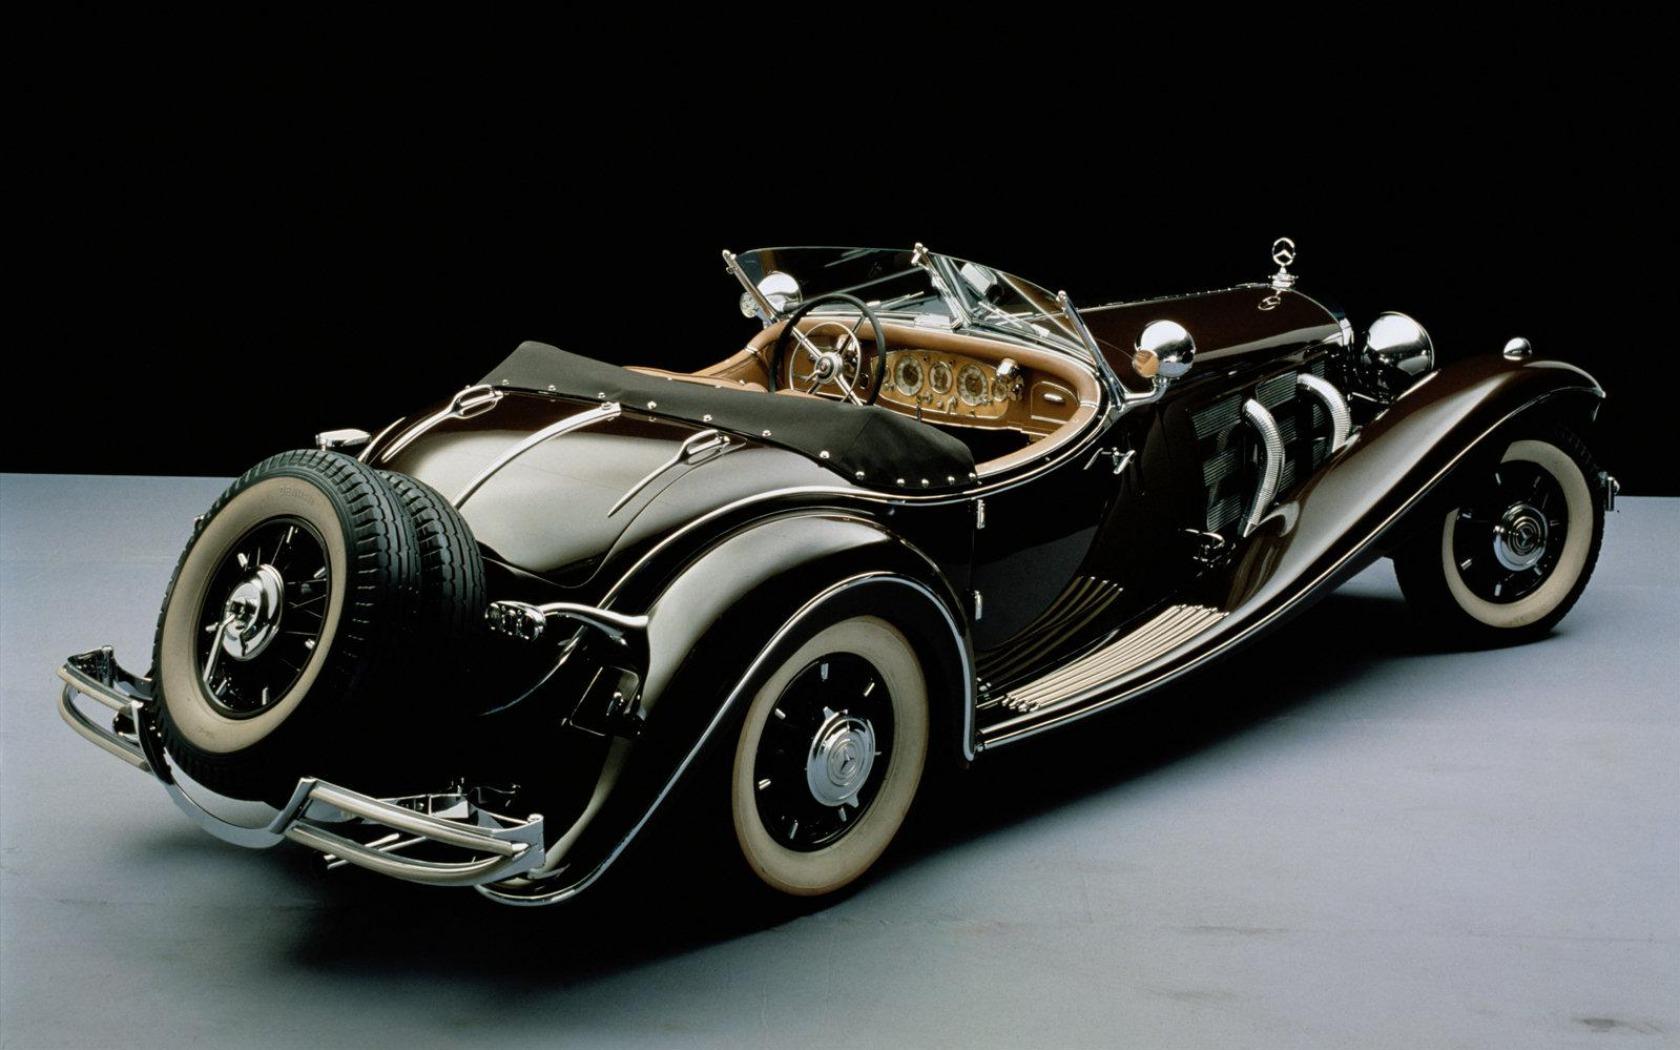 Mercedes Benz Vintage Car wallpaper 1680x1050 55247 WallpaperUP 1680x1050